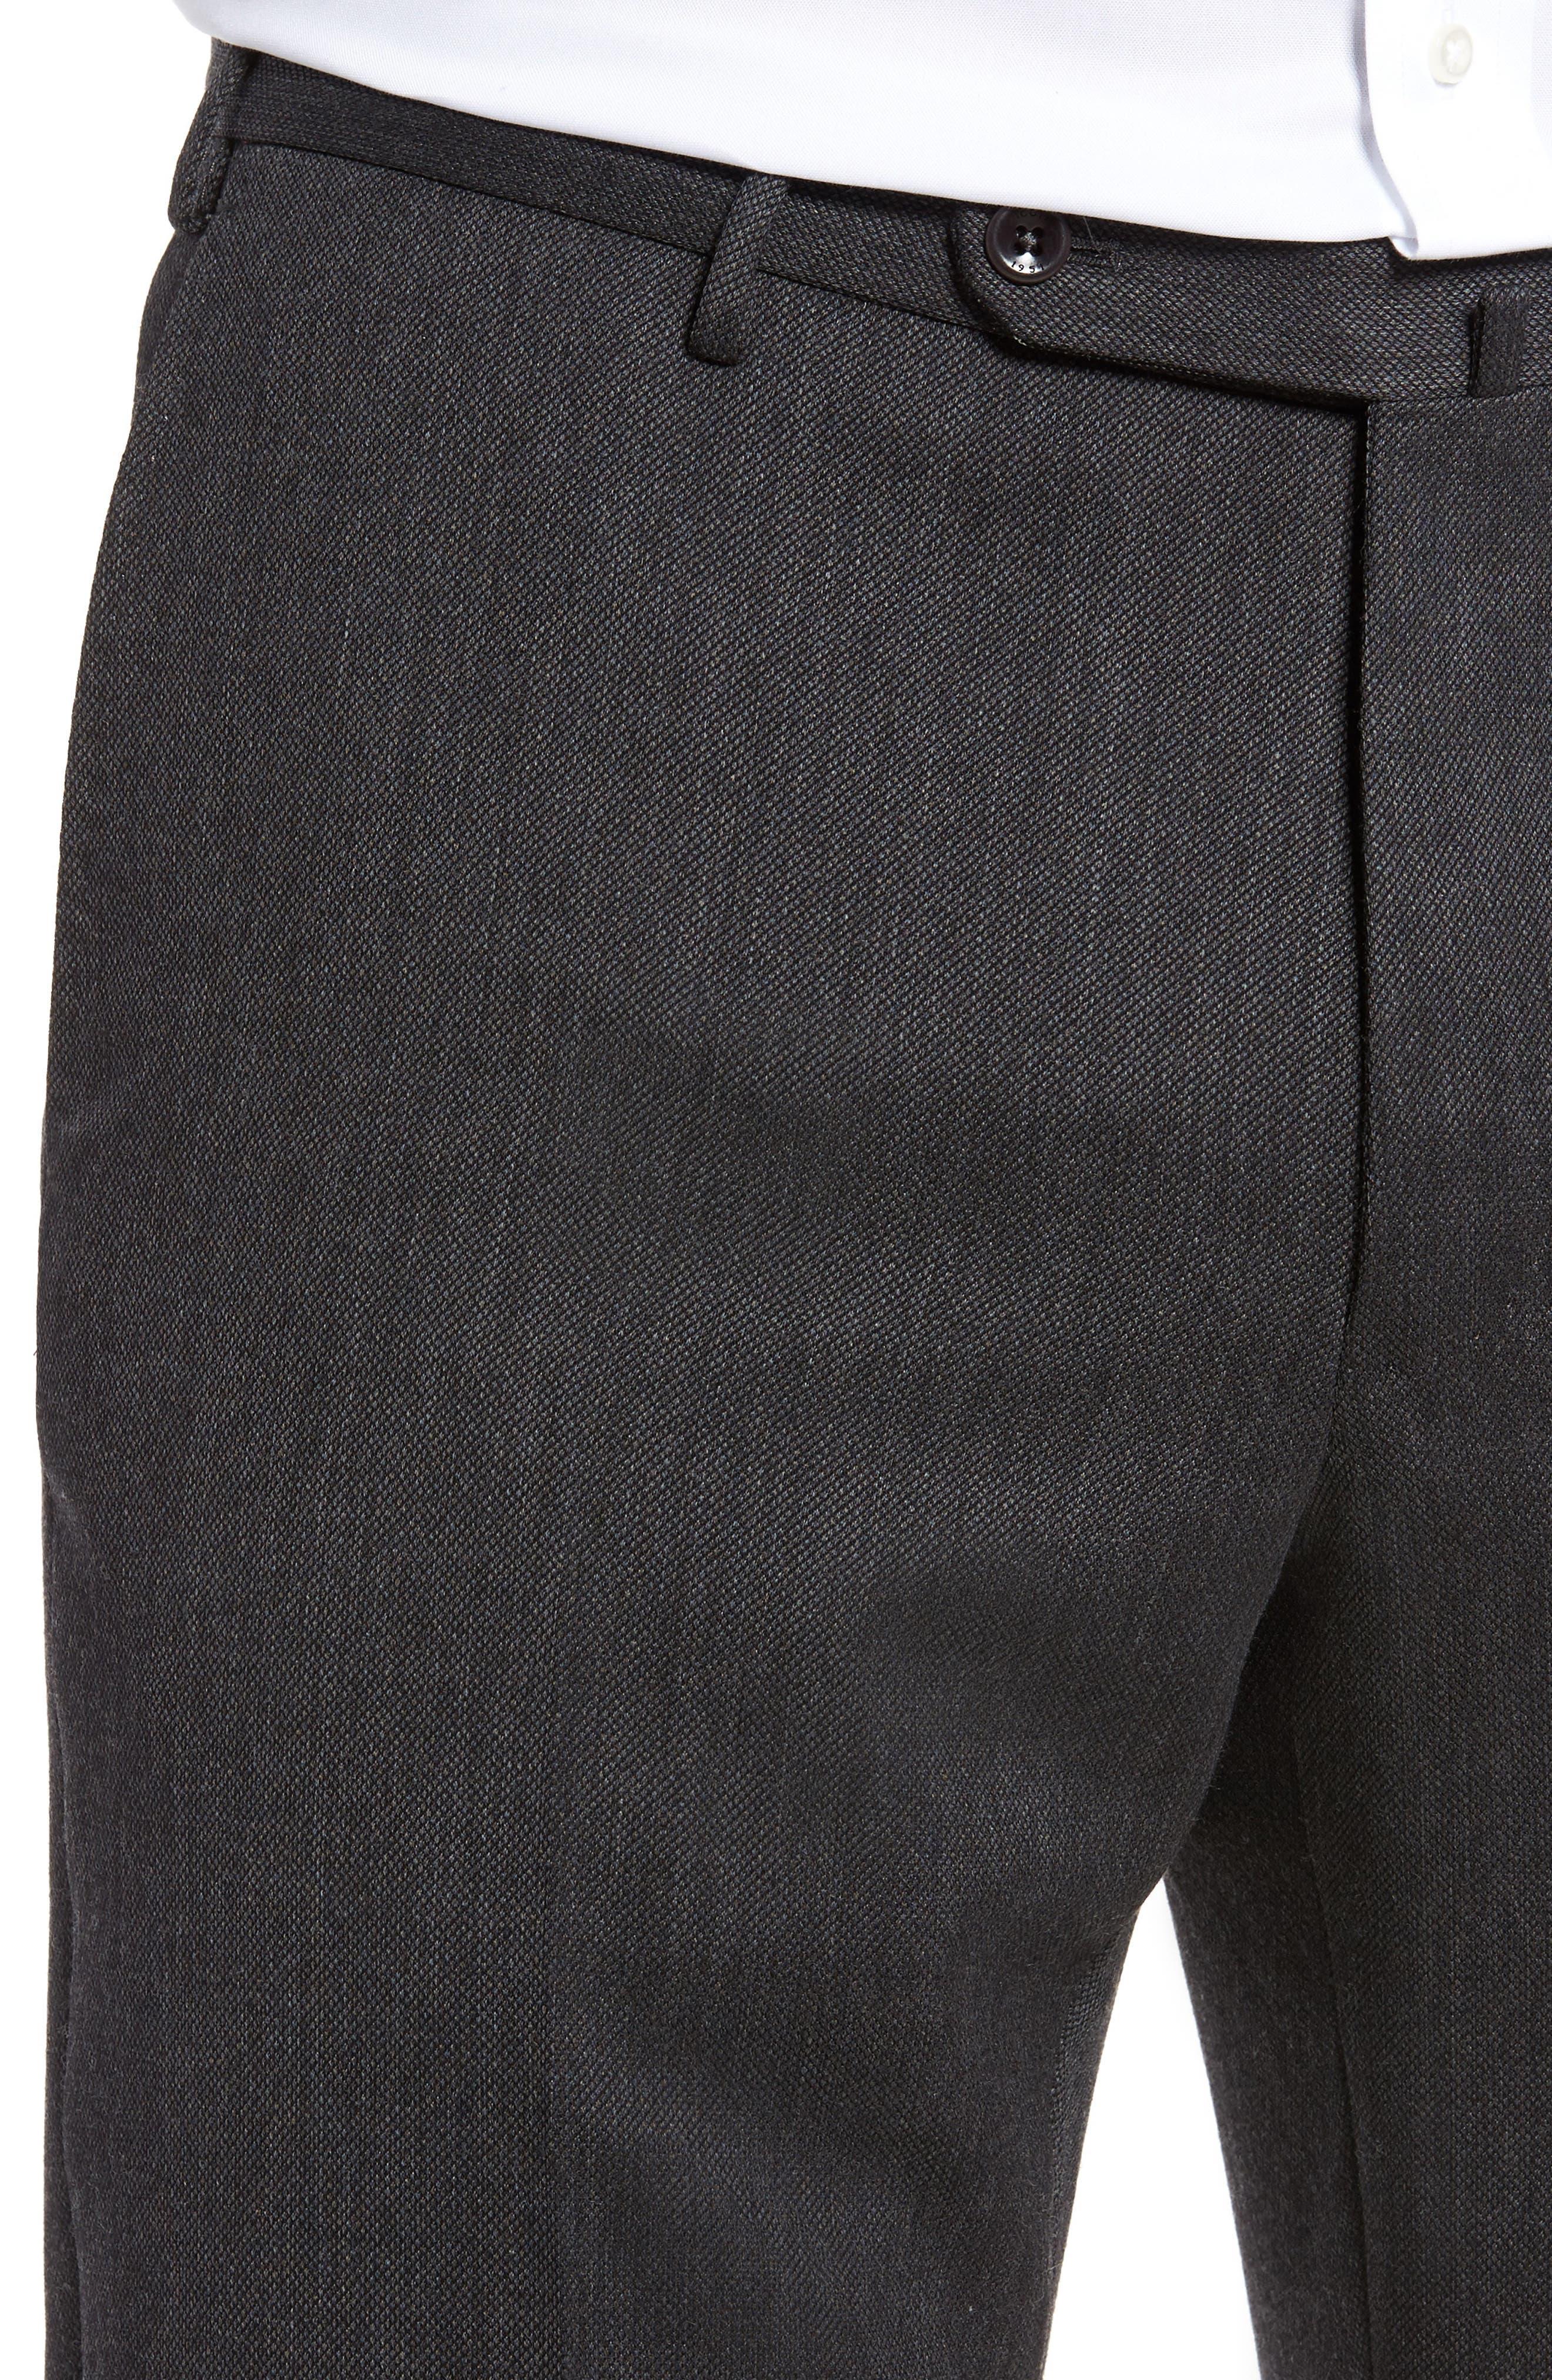 Benson Flat Front Wool Blend Trousers,                             Alternate thumbnail 5, color,                             025